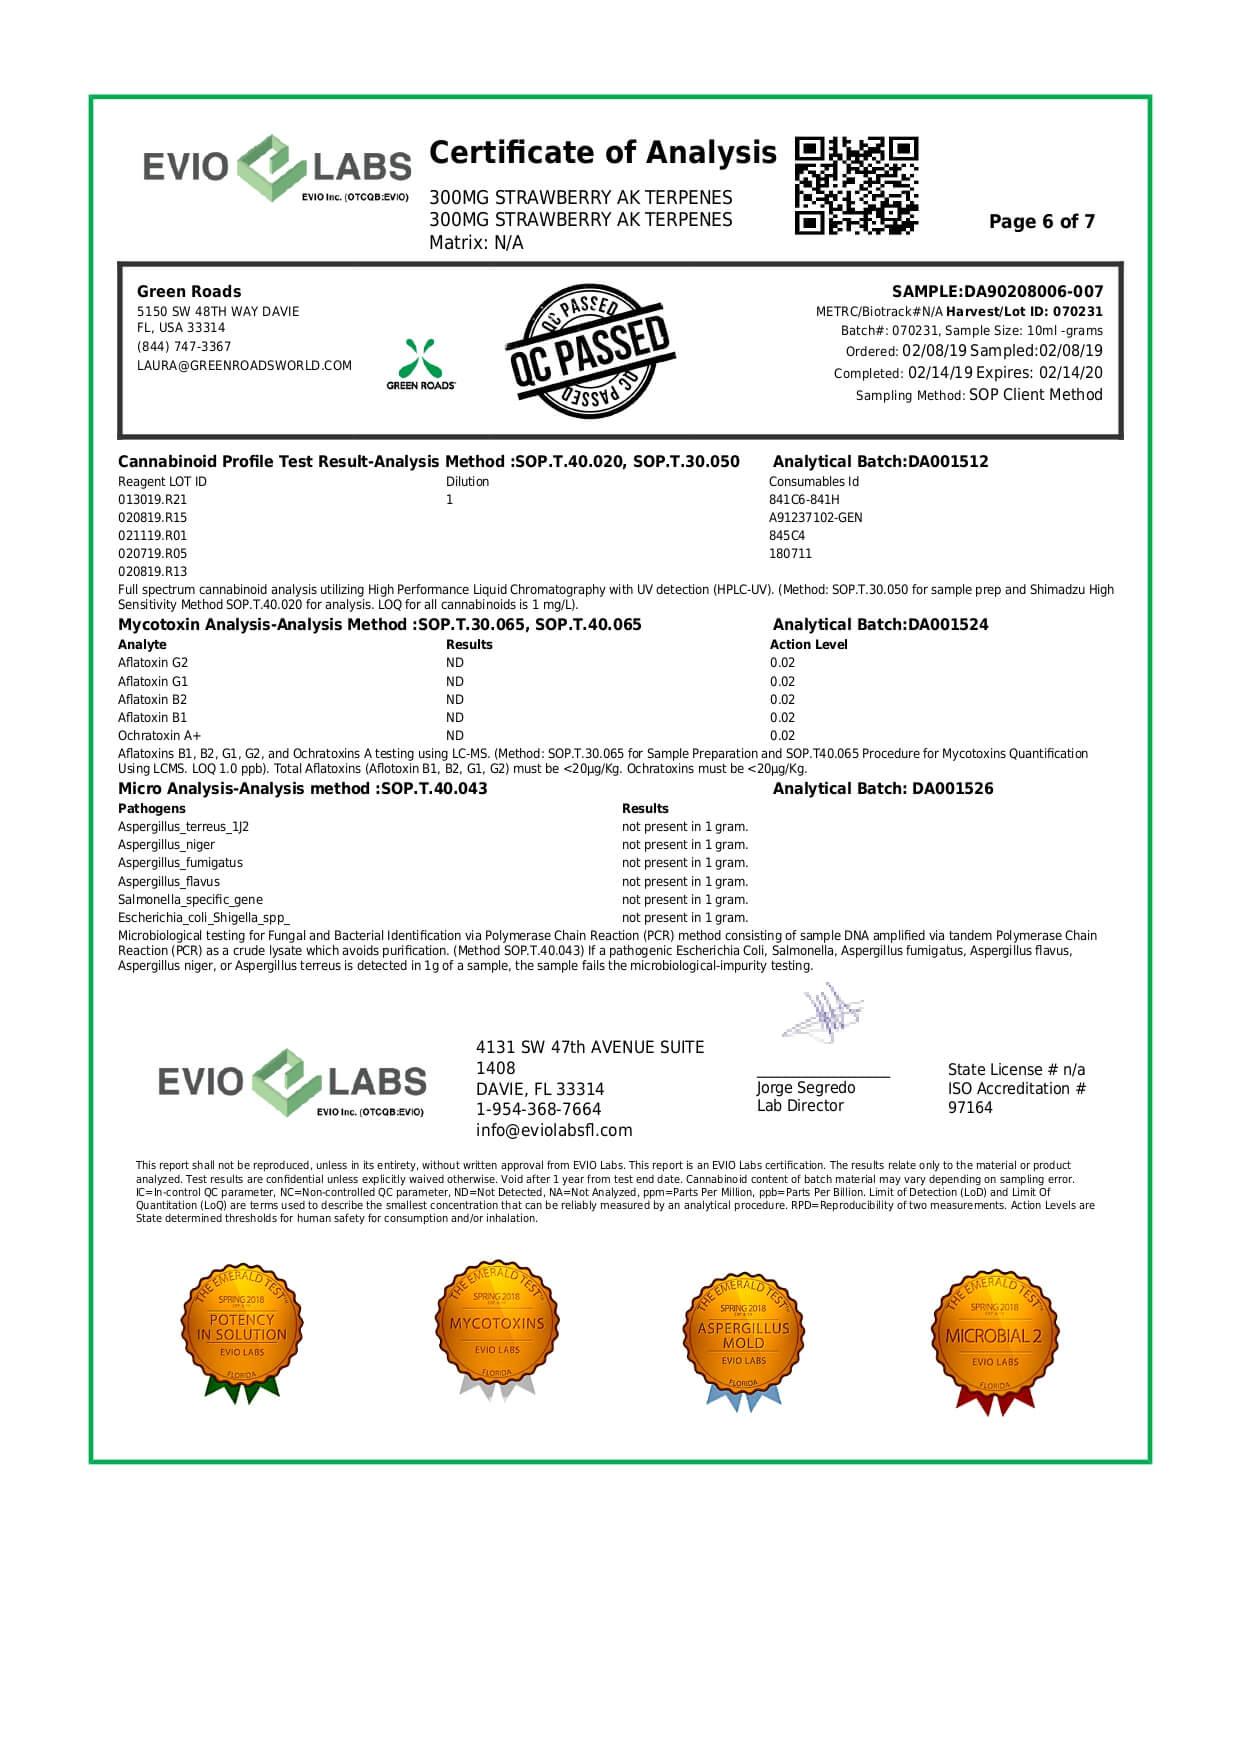 Green Roads CBD Terpenes Oil Strawberry AK 300mg Lab Report